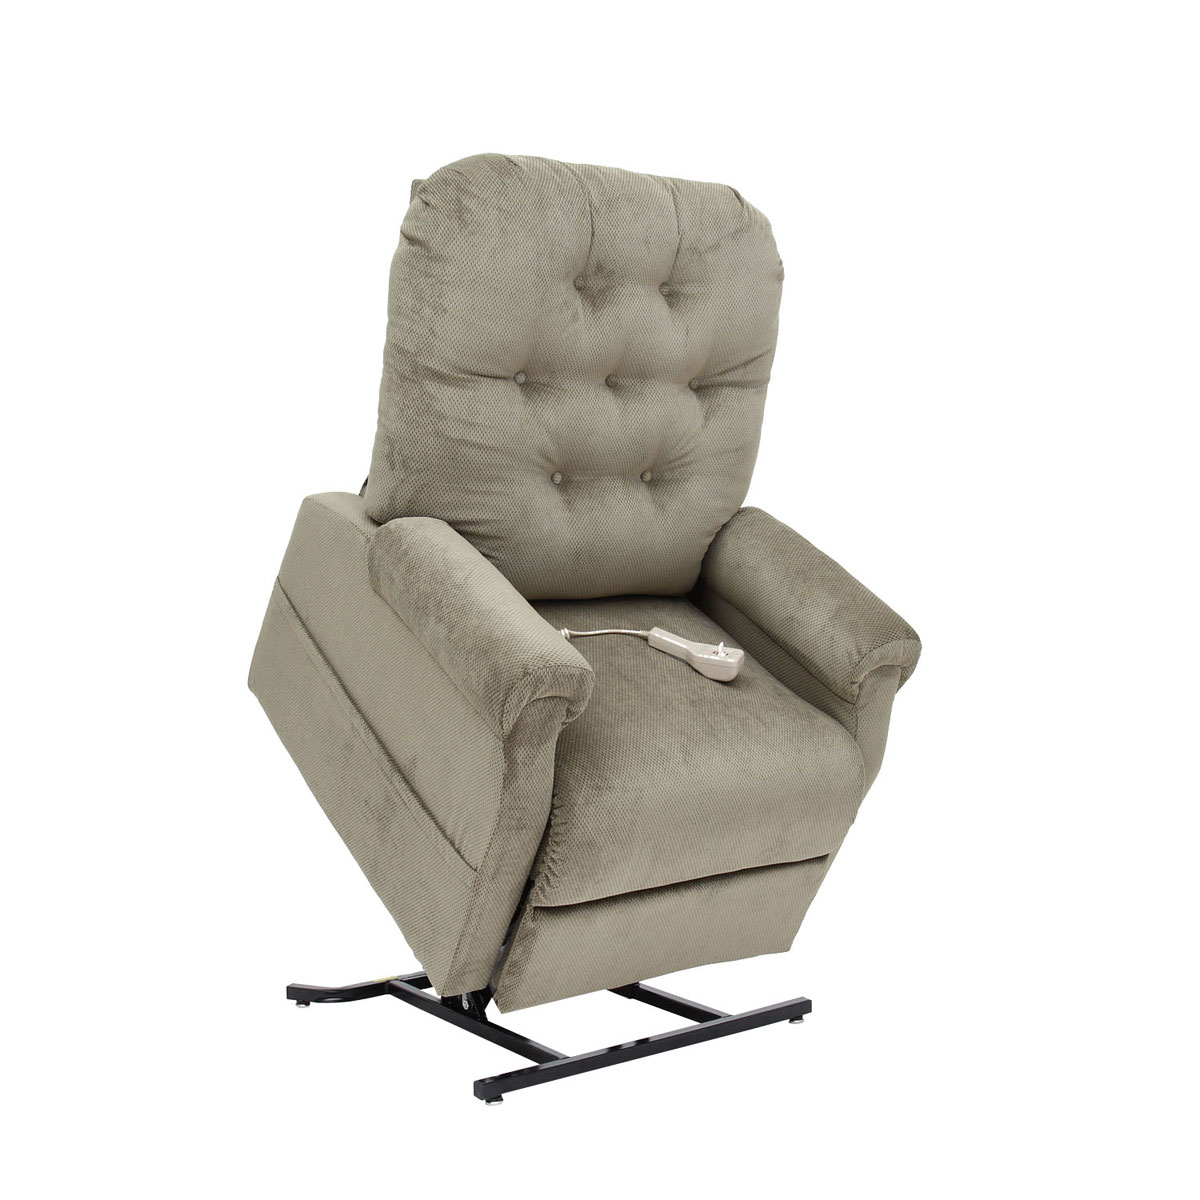 Infinite Position Recliner Power Lift Chair New Brandy